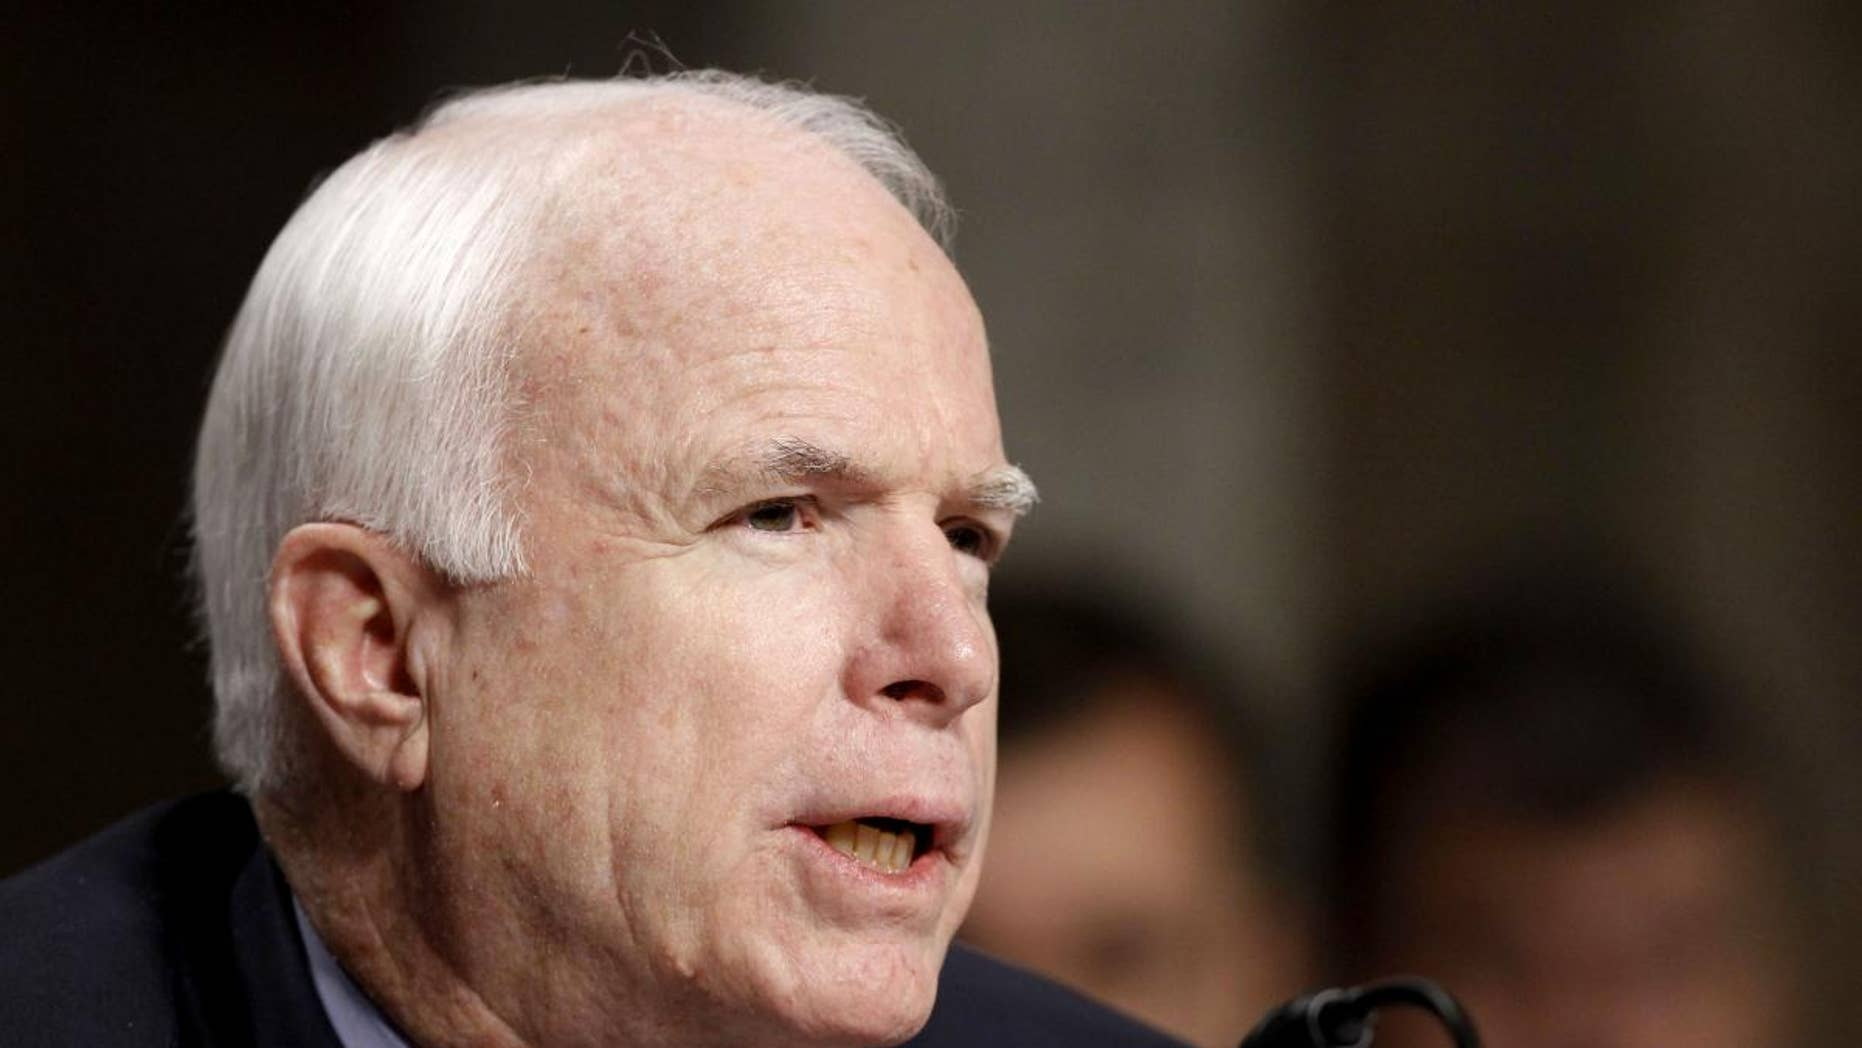 Sen. John McCain, R-Ariz., the ranking Republican on the Senate Armed Services Committee, speaks on Thursday, Dec. 2, 2010 (AP Photo/Alex Brandon)